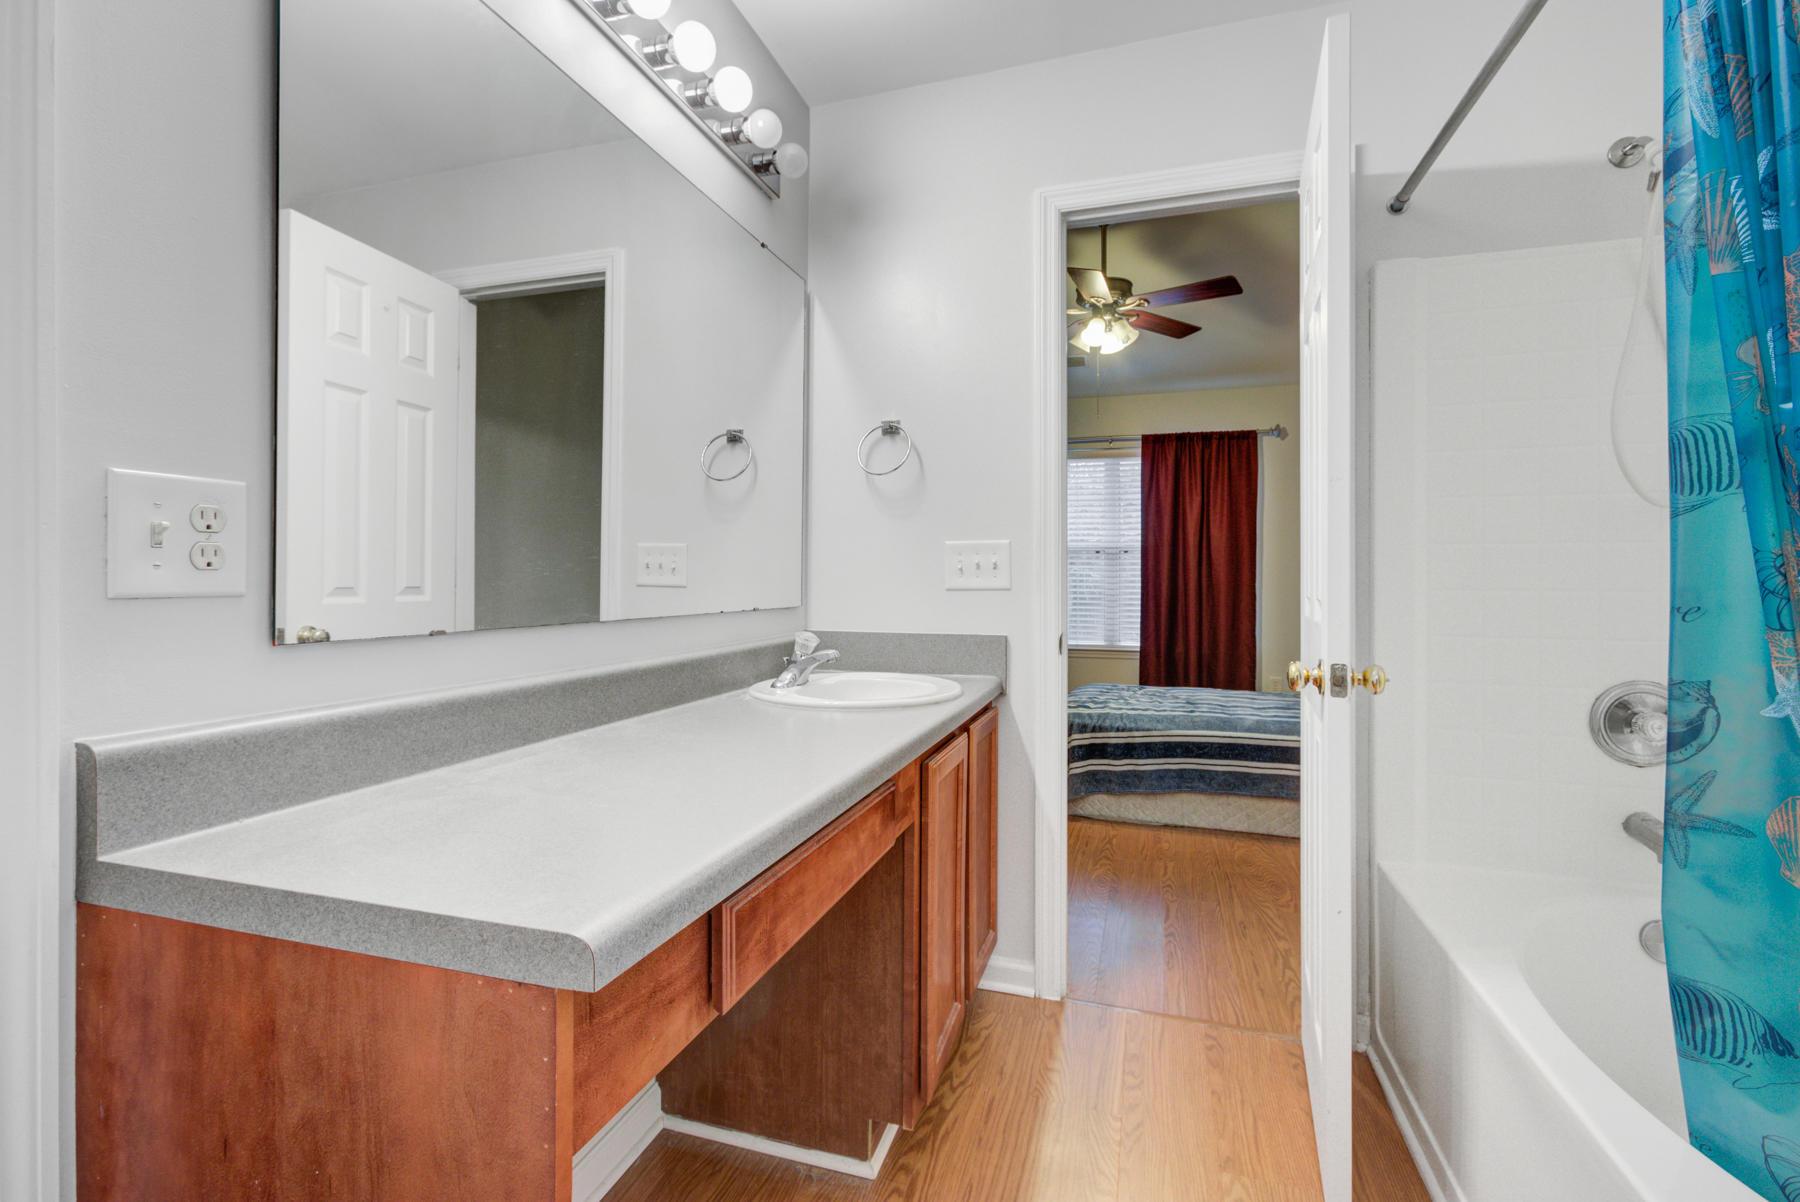 Grand Oaks Plantation Homes For Sale - 564 Hainesworth, Charleston, SC - 0